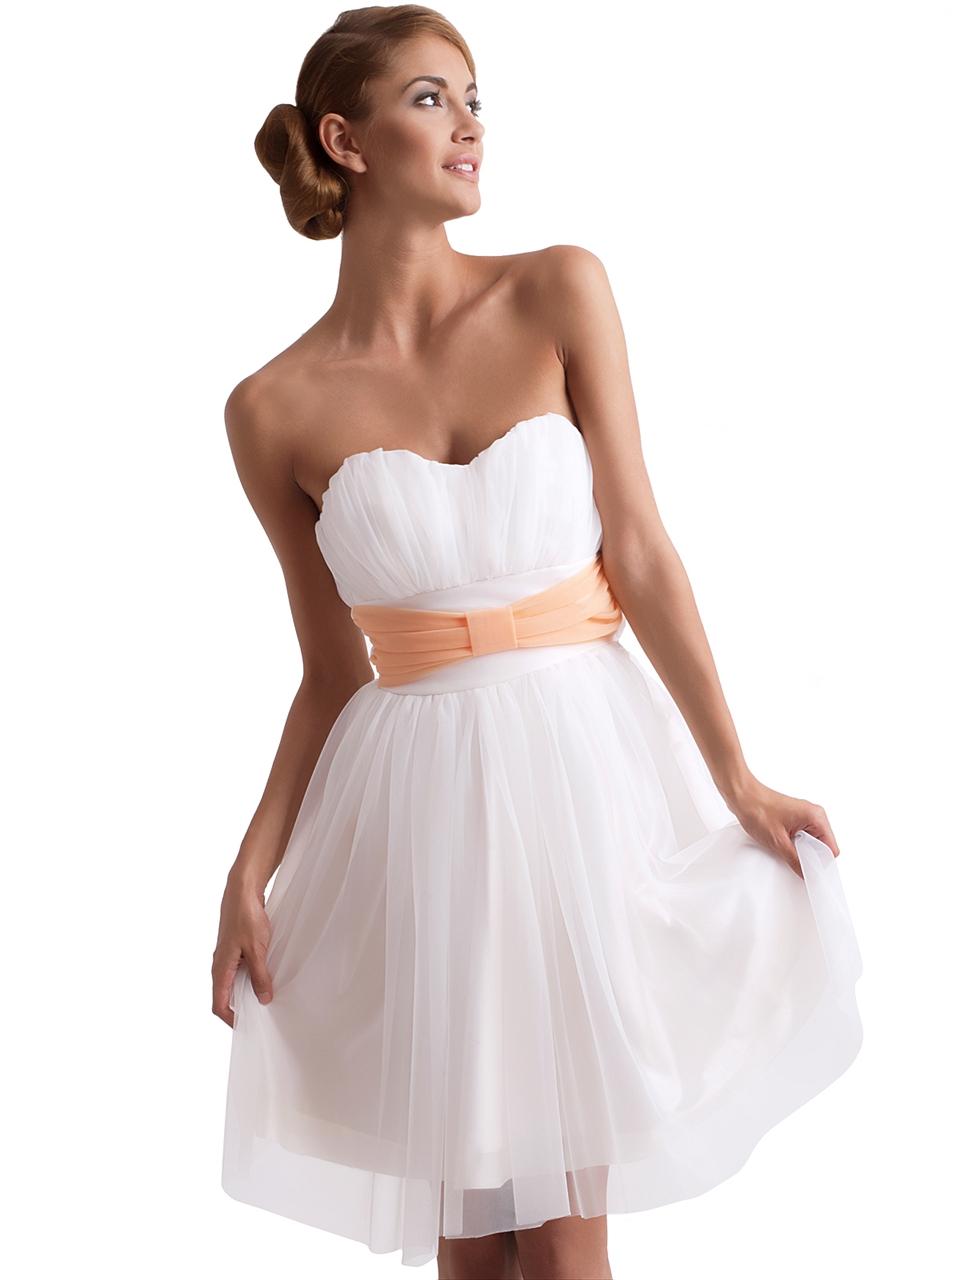 en-trend-beyaz-elbise-modelleri-23